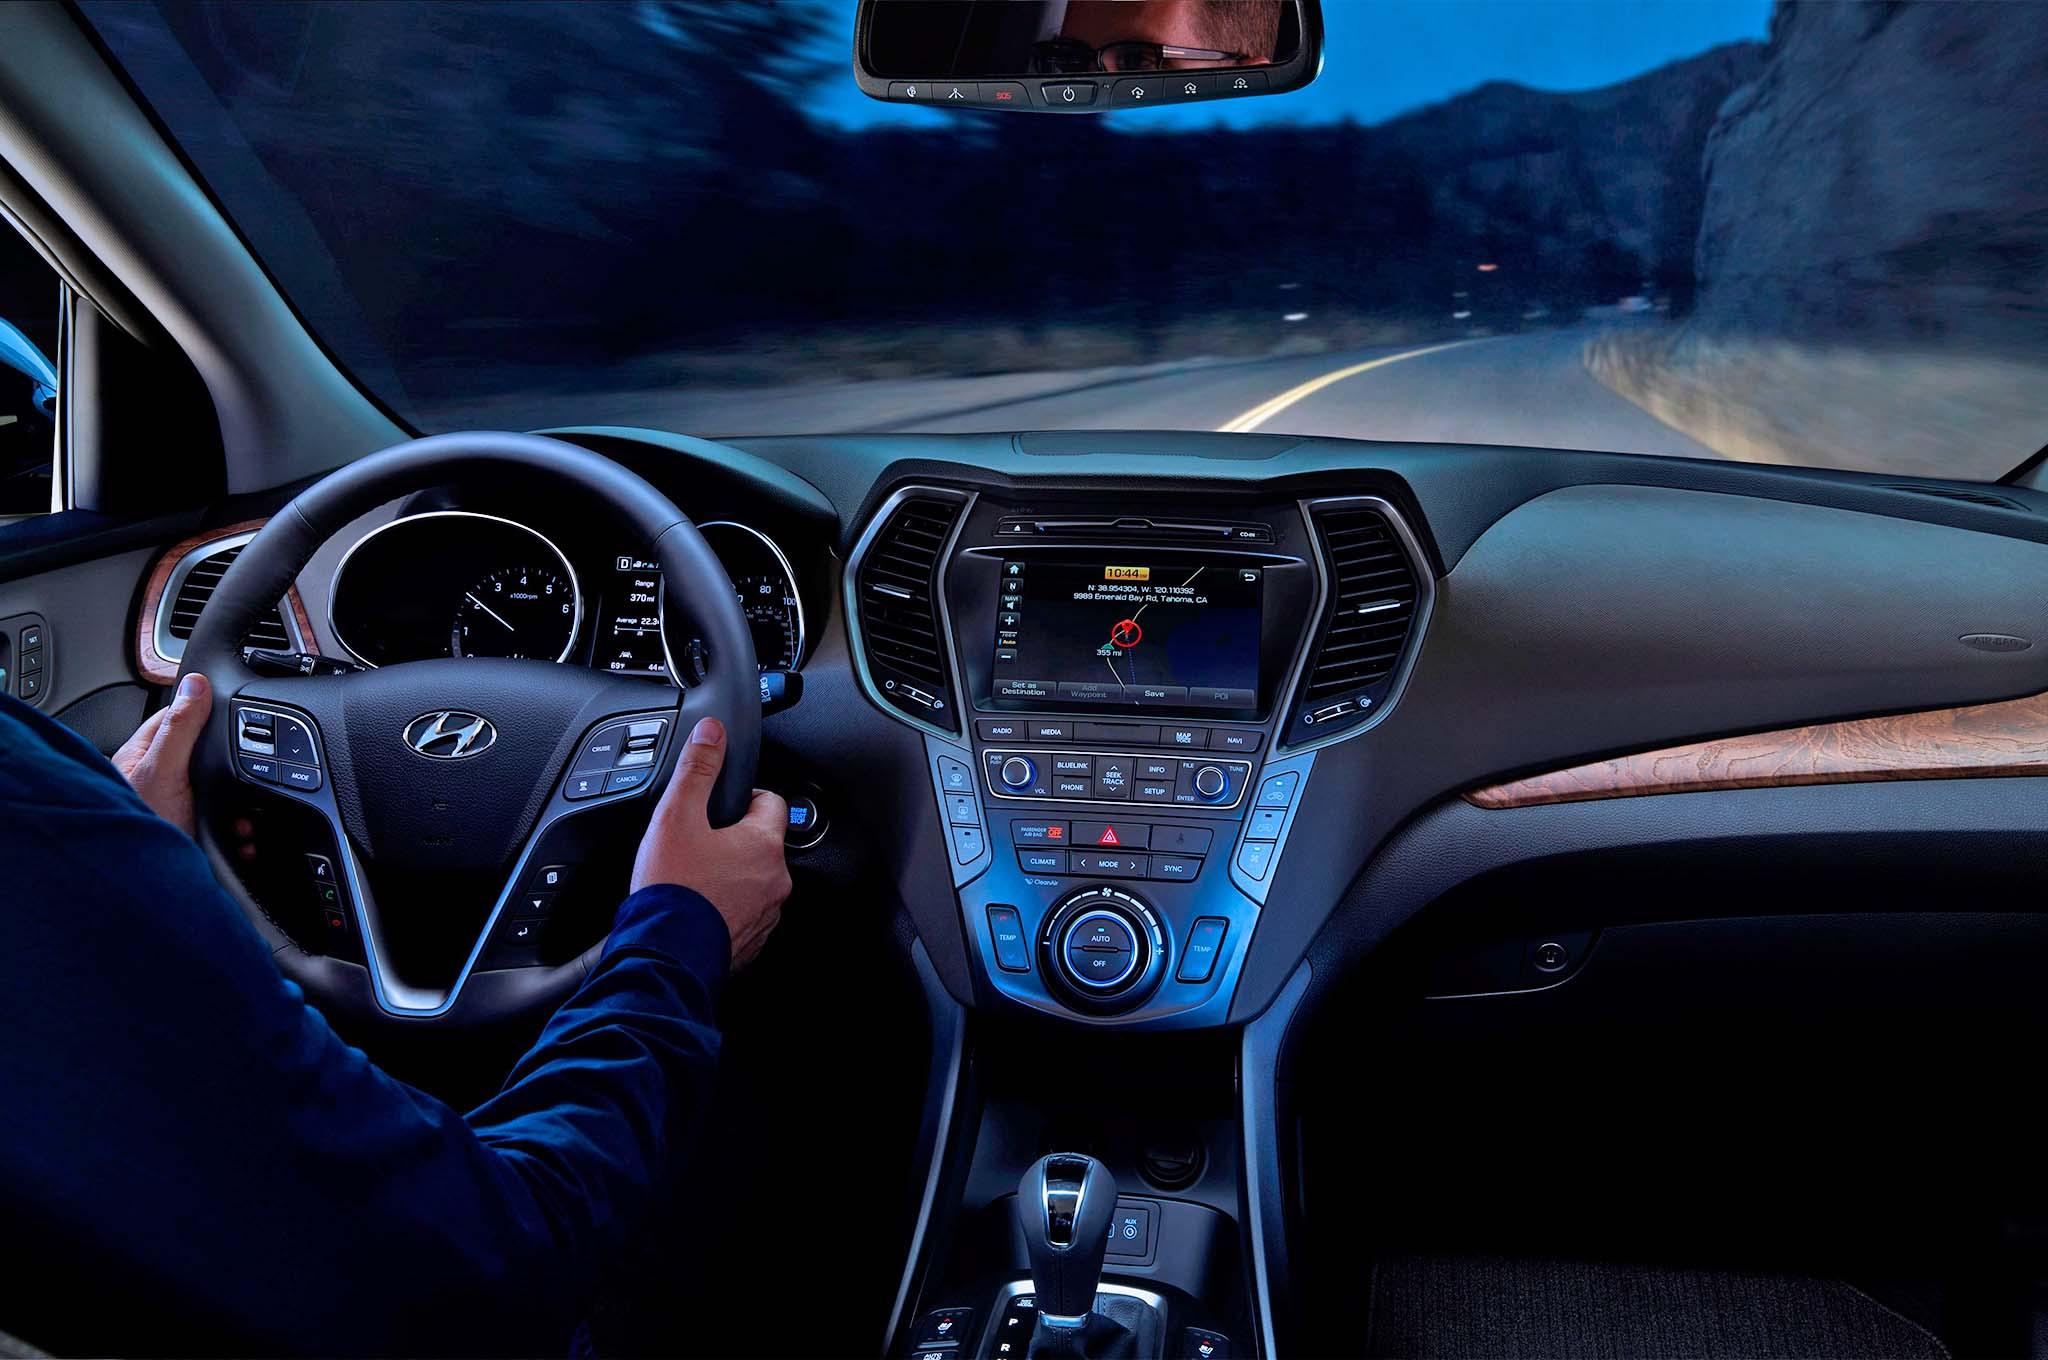 2018 Hyundai Santa Fe interior view night - Motor Trend en ...